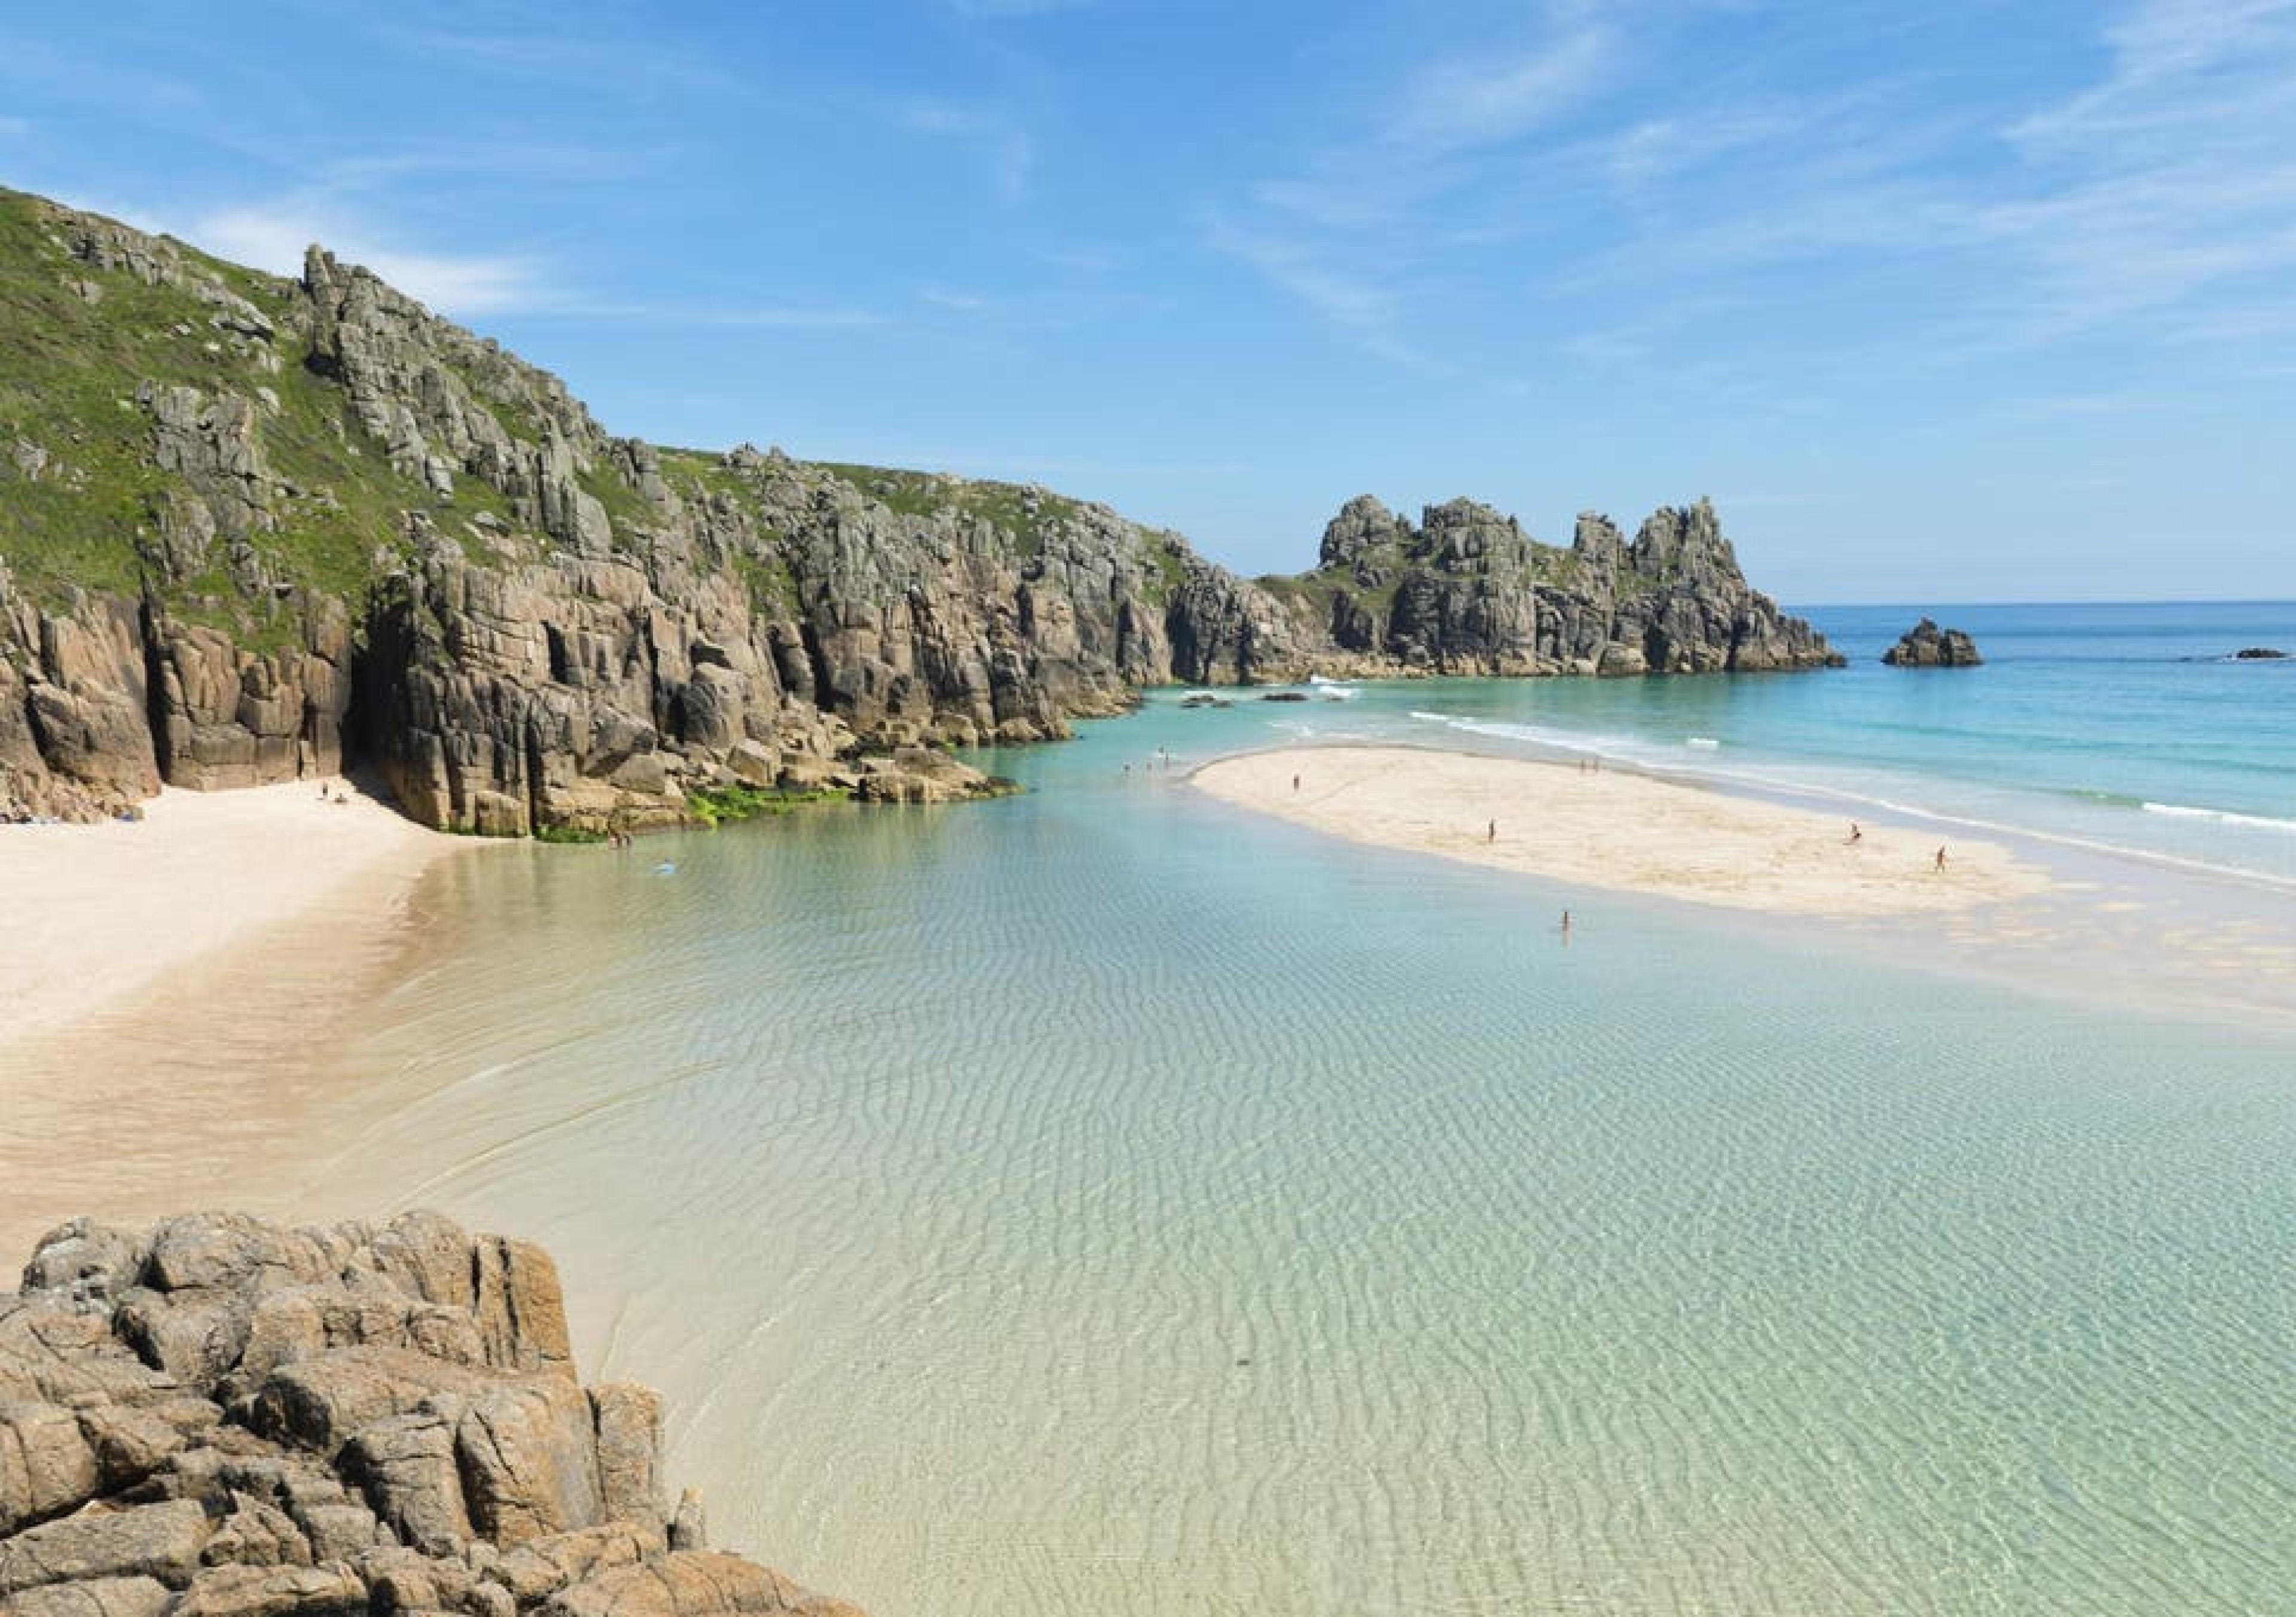 Top 5 UK beaches